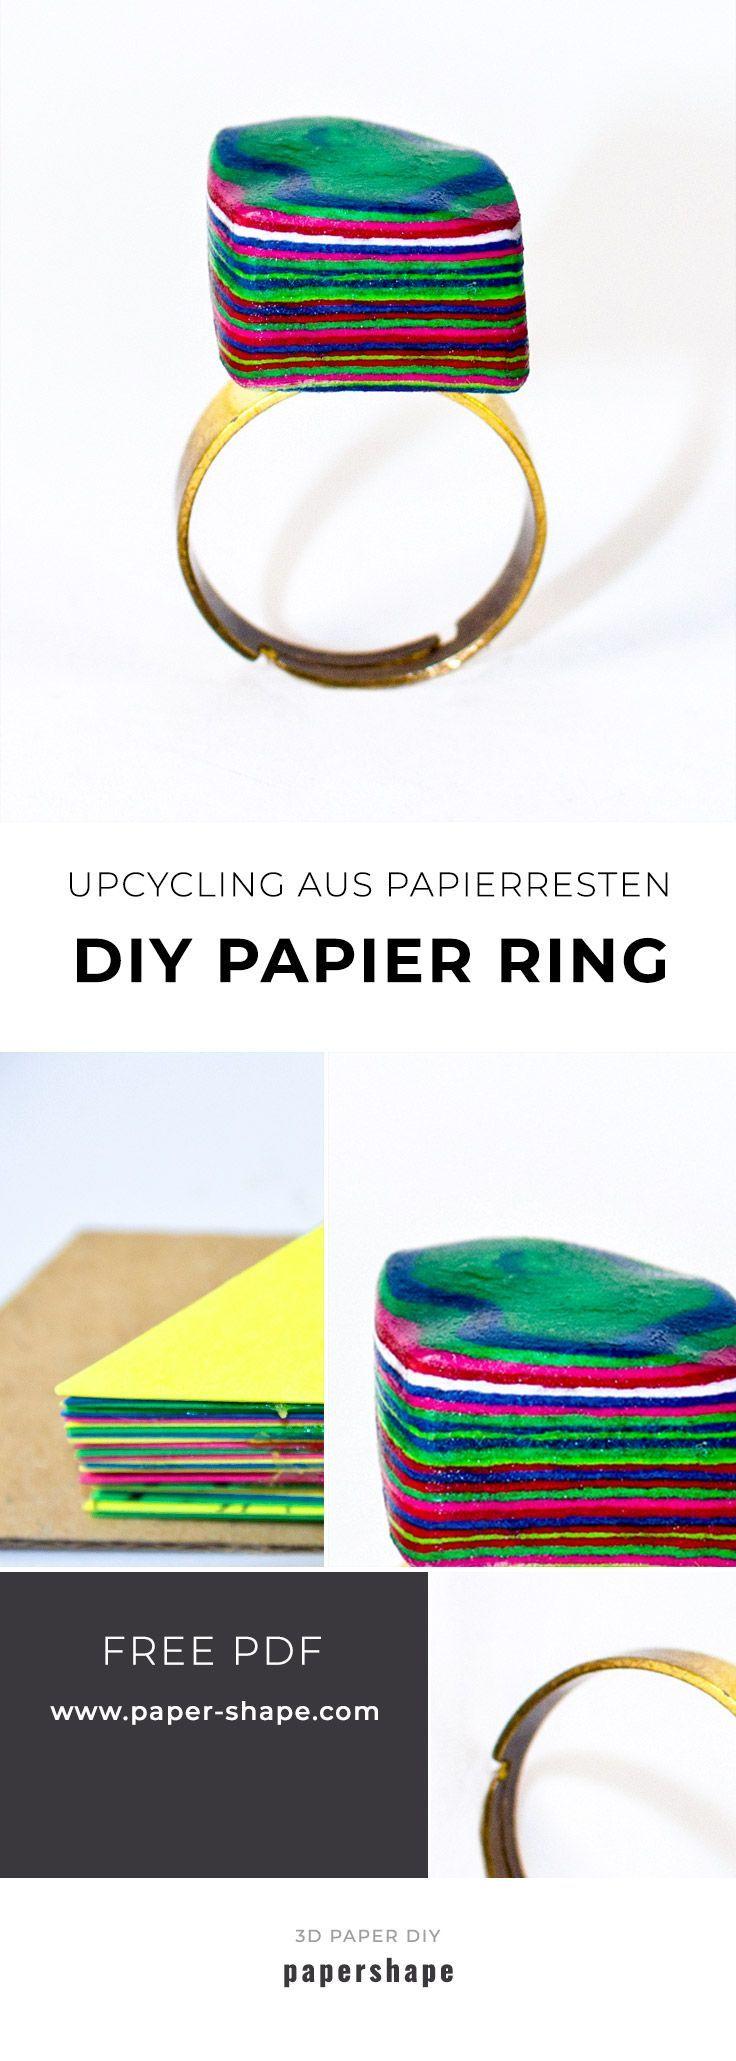 Stylishen Papierring selber machen aus Papierresten (Upcycling Idee) #upcyclingideen